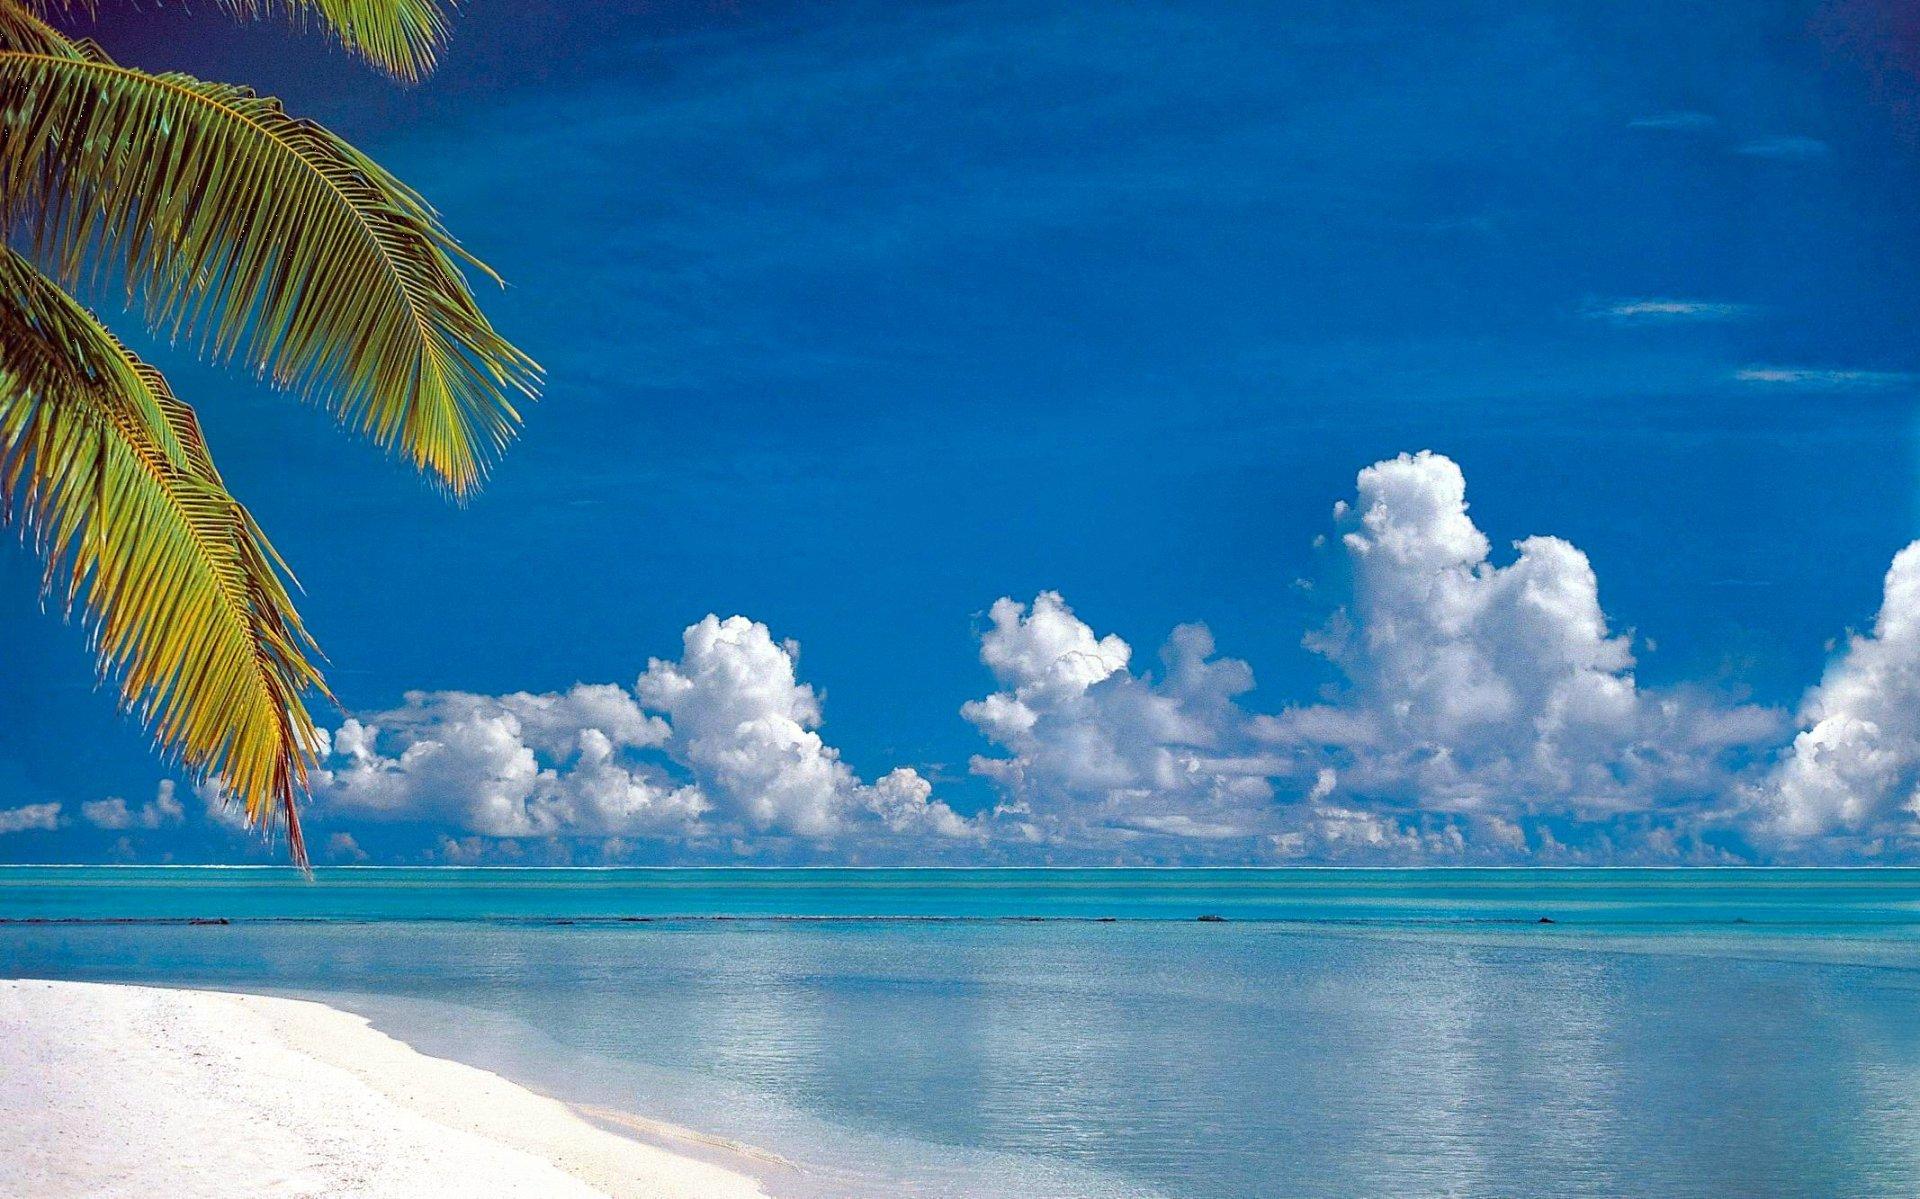 Earth - Tropical  Ocean Blue Sky Cloud Turquoise Beach Horizon Reflection Palm Tree Summer Wallpaper